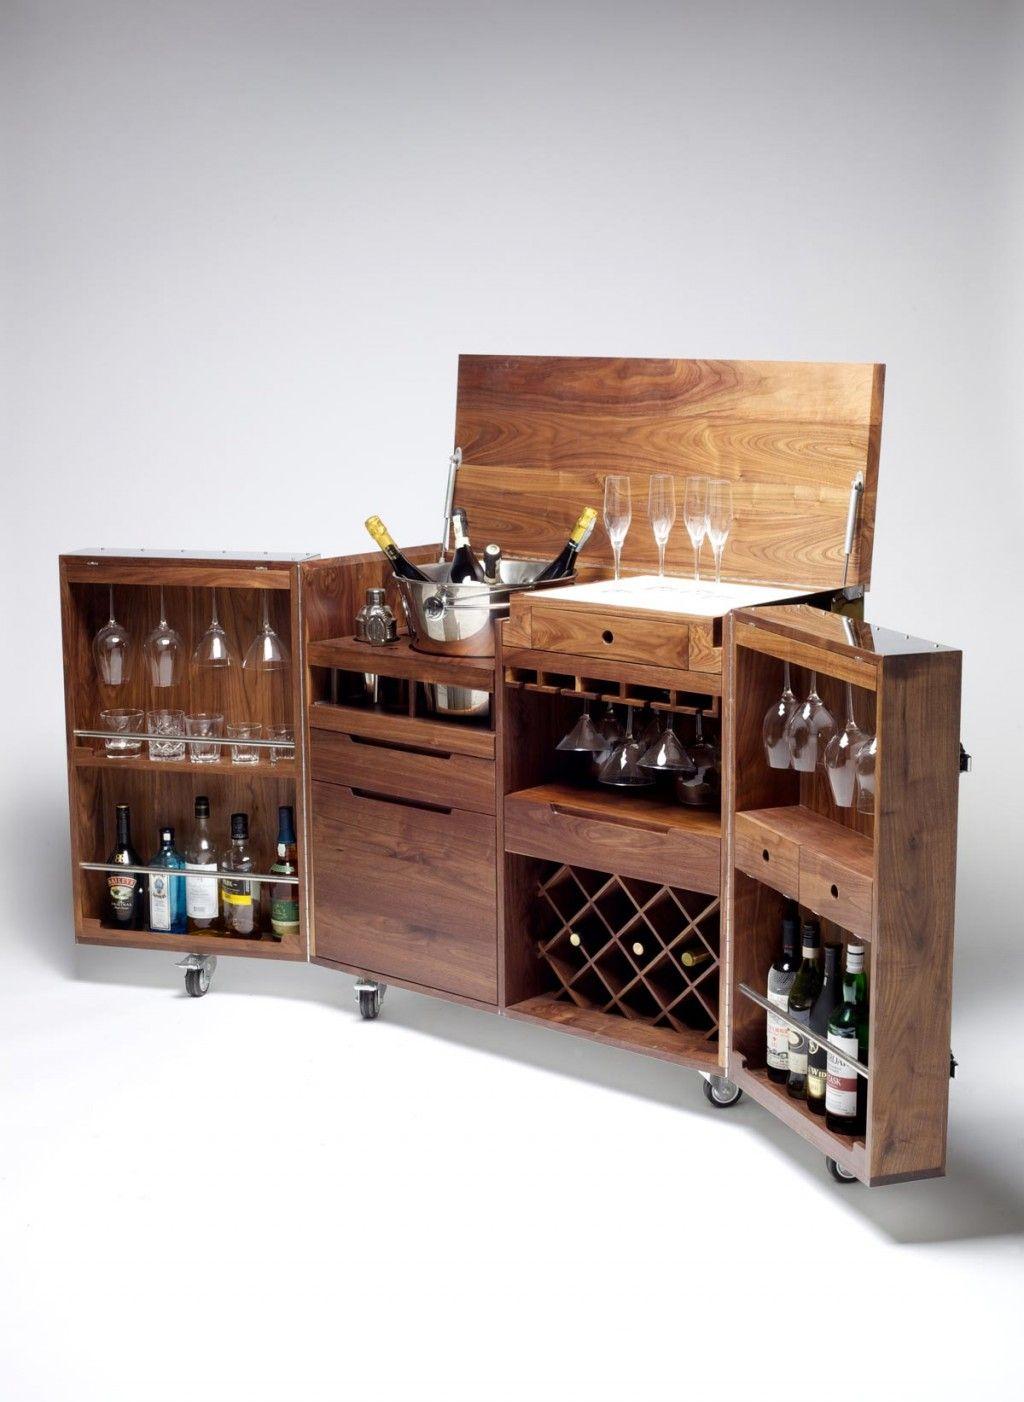 Steel Crates By Naihan Li Mobile Bar Furniture Modern Wooden